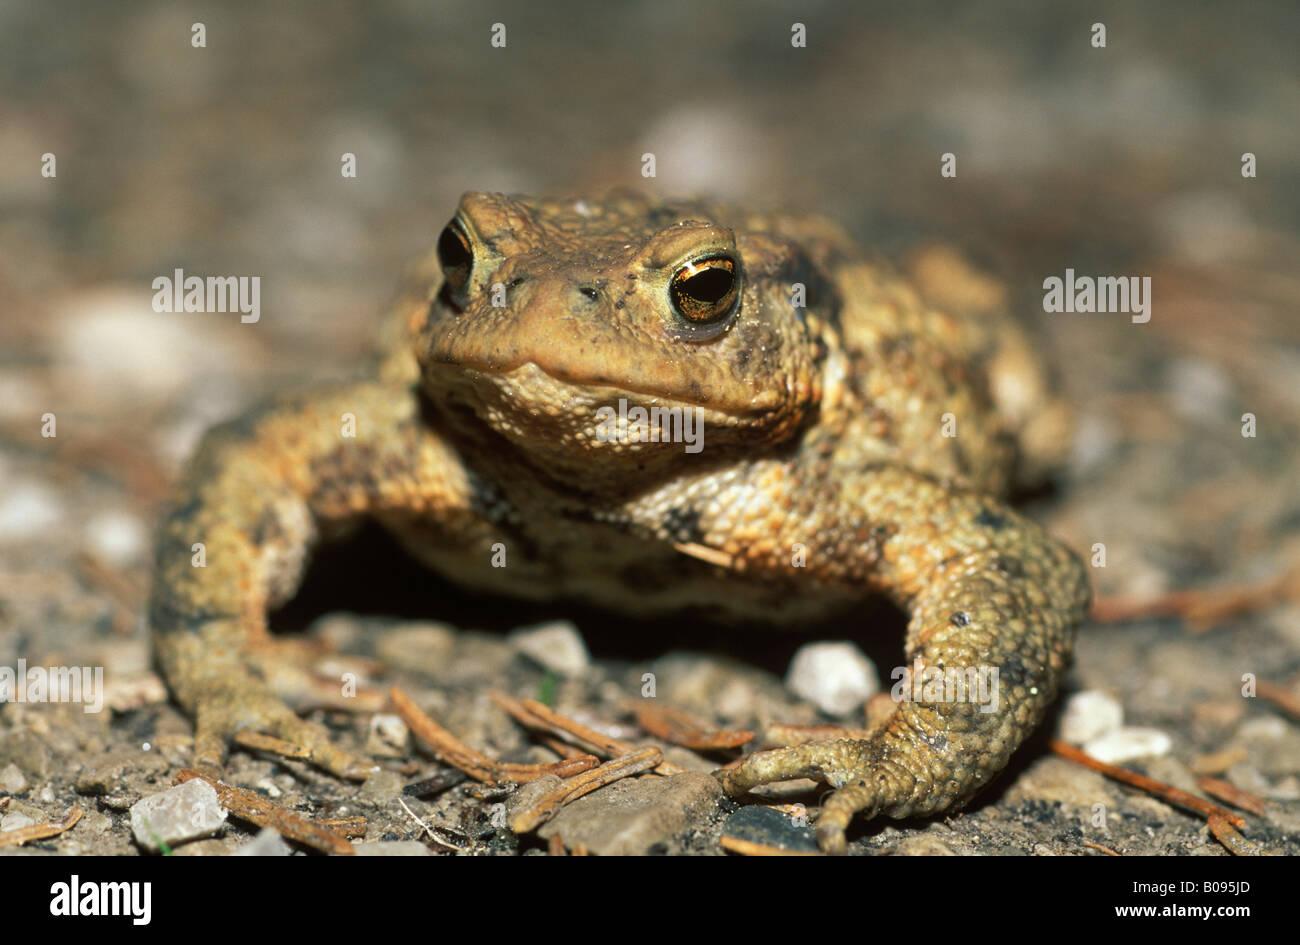 Common Toad (Bufo bufo), Germany, Europe Stock Photo